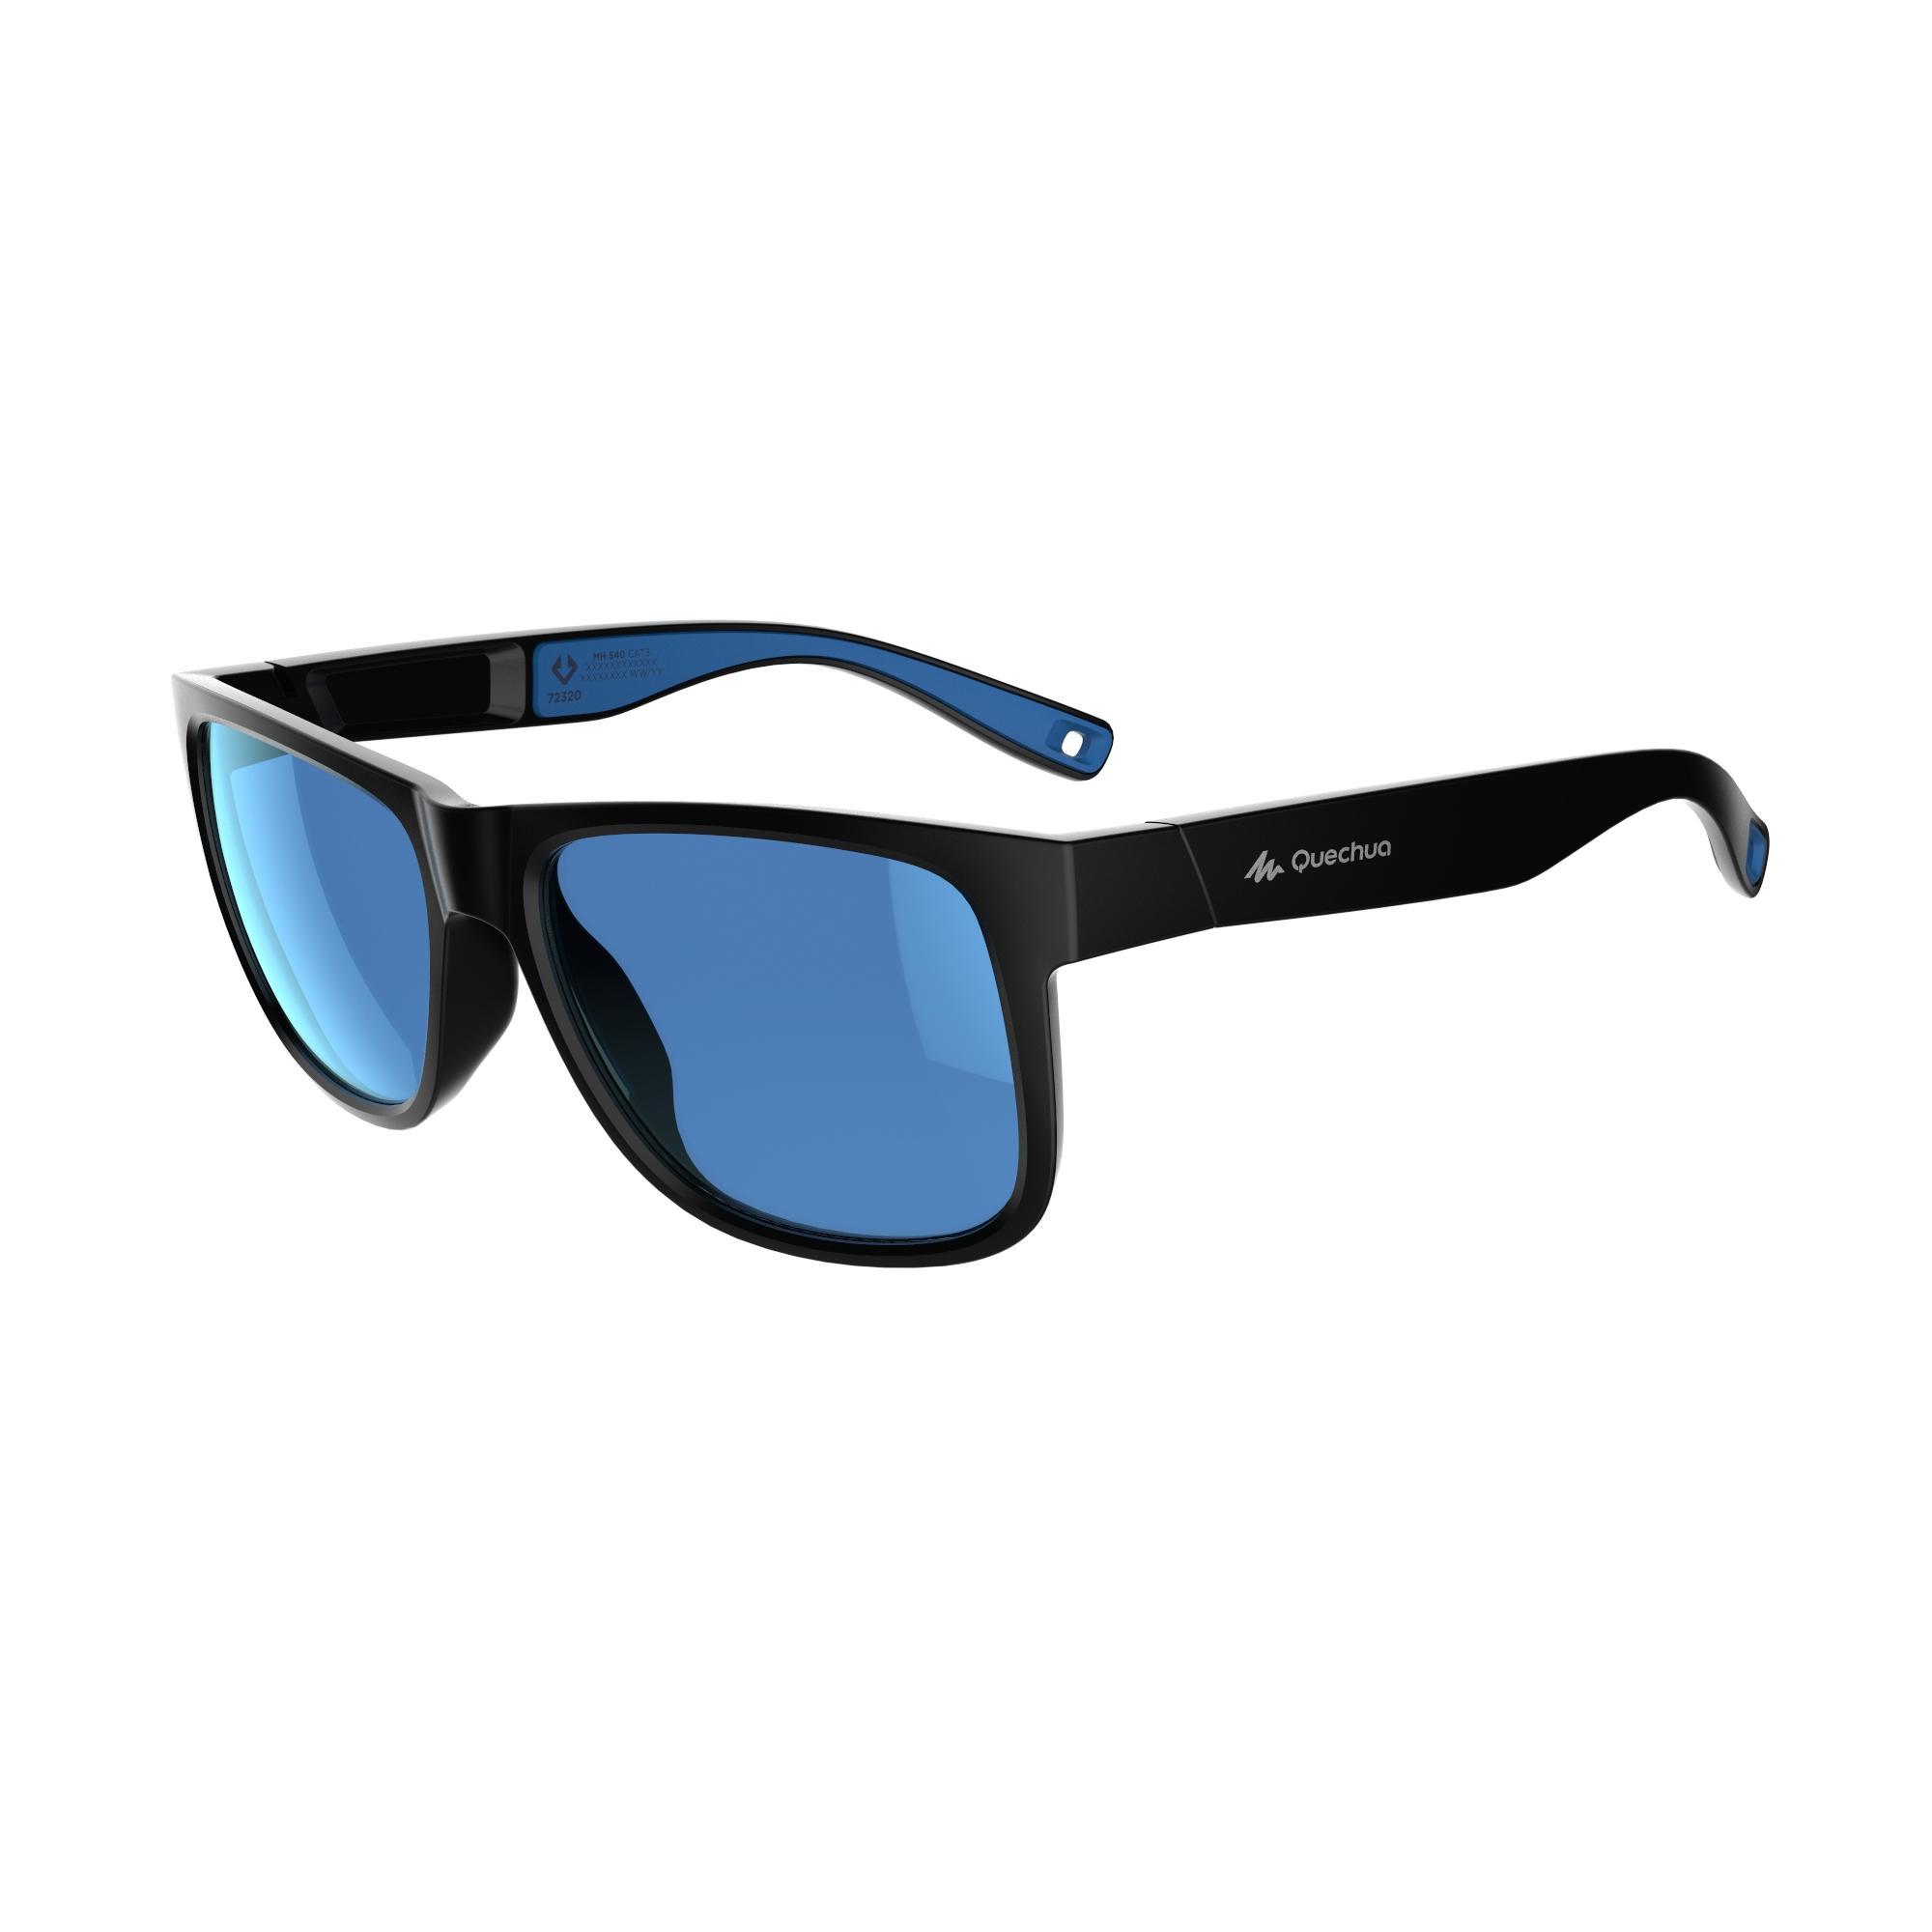 Lentes de sol de senderismo adulto MH 540 azul translúcido de categoría 3